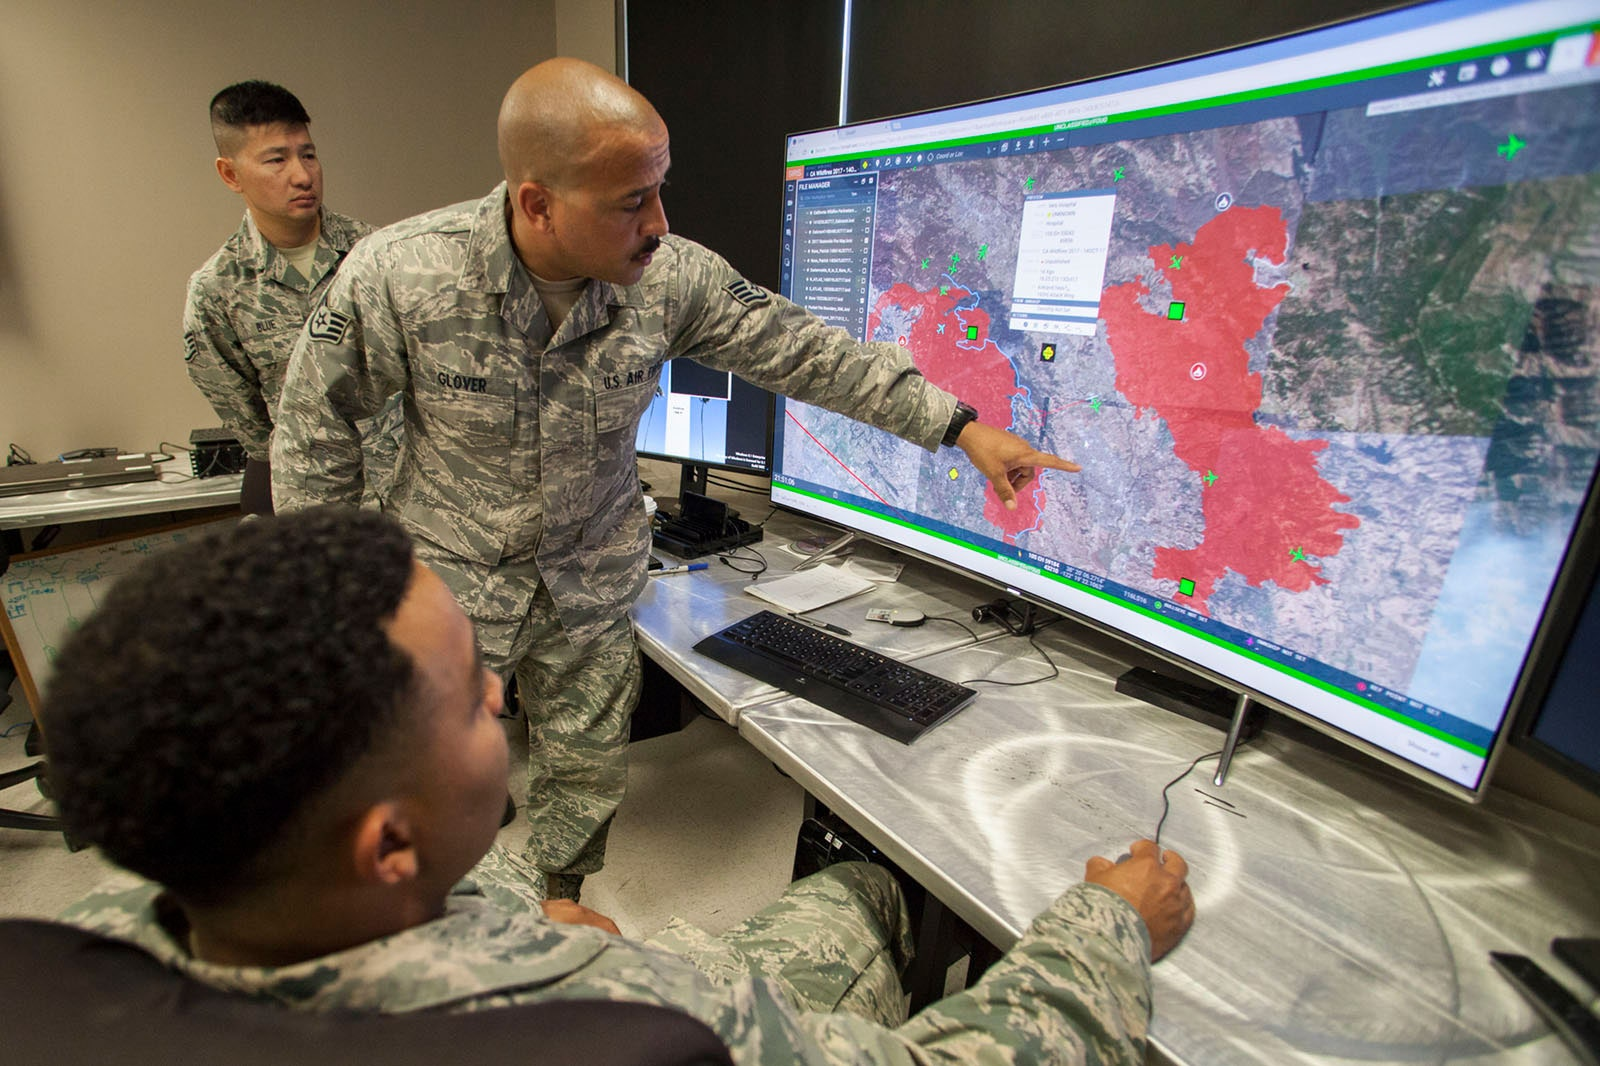 Image may contain Human Person Electronics Monitor Display Screen Military Uniform Military and Computer Keyboard